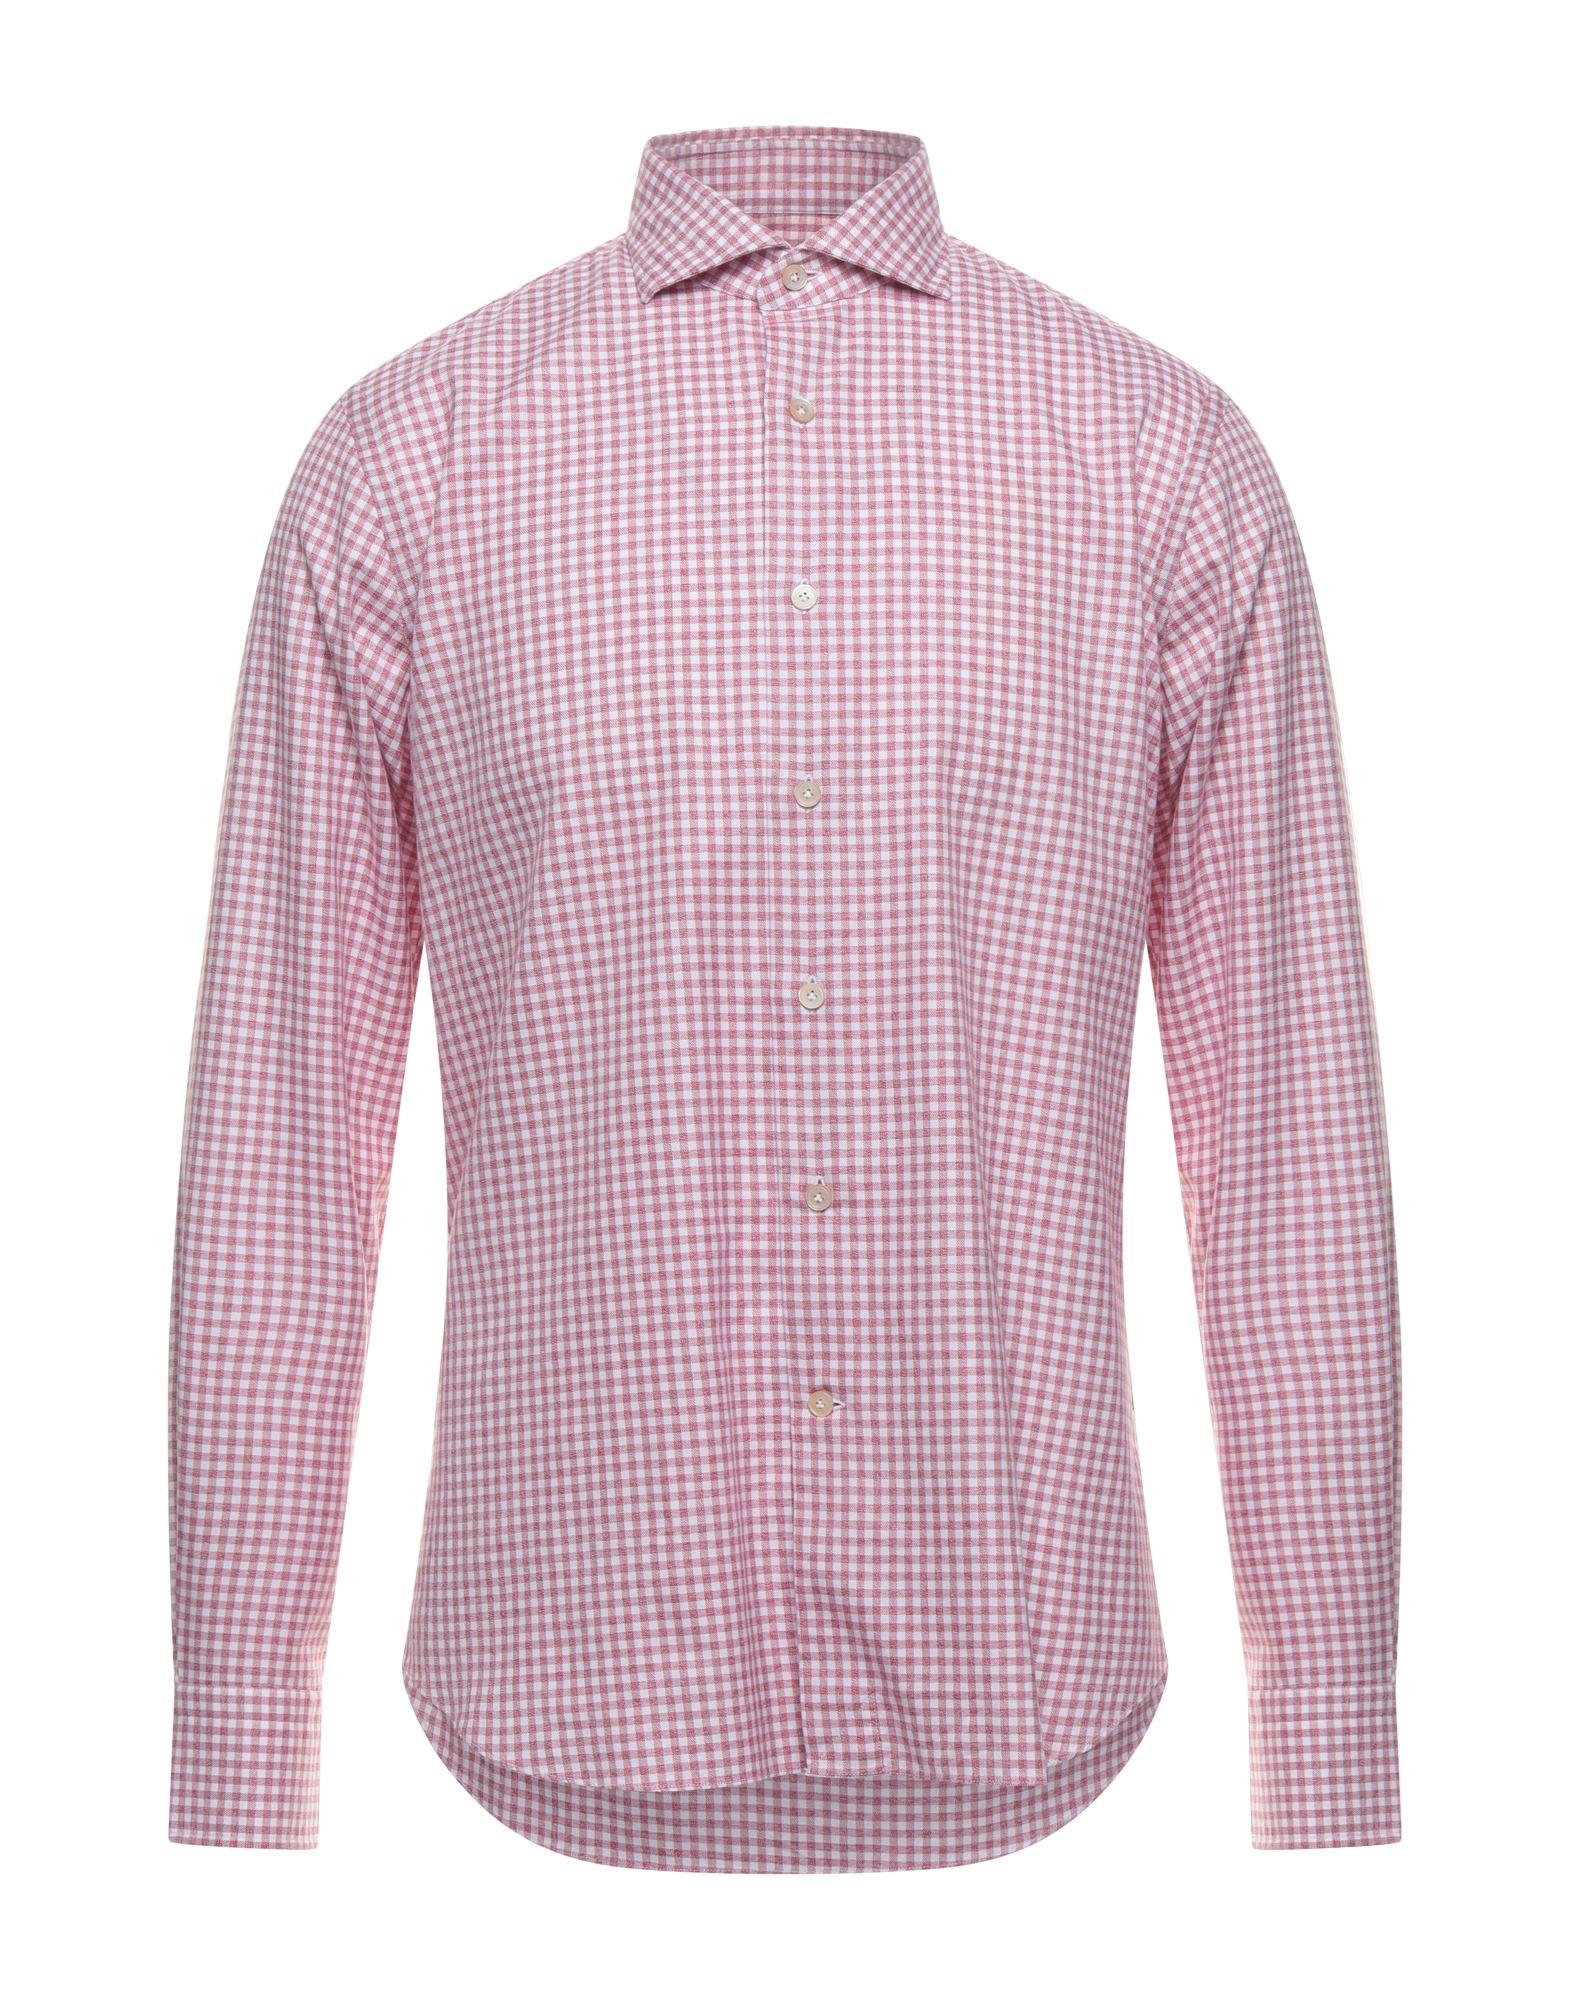 Alessandro Gherardi Shirts In Maroon